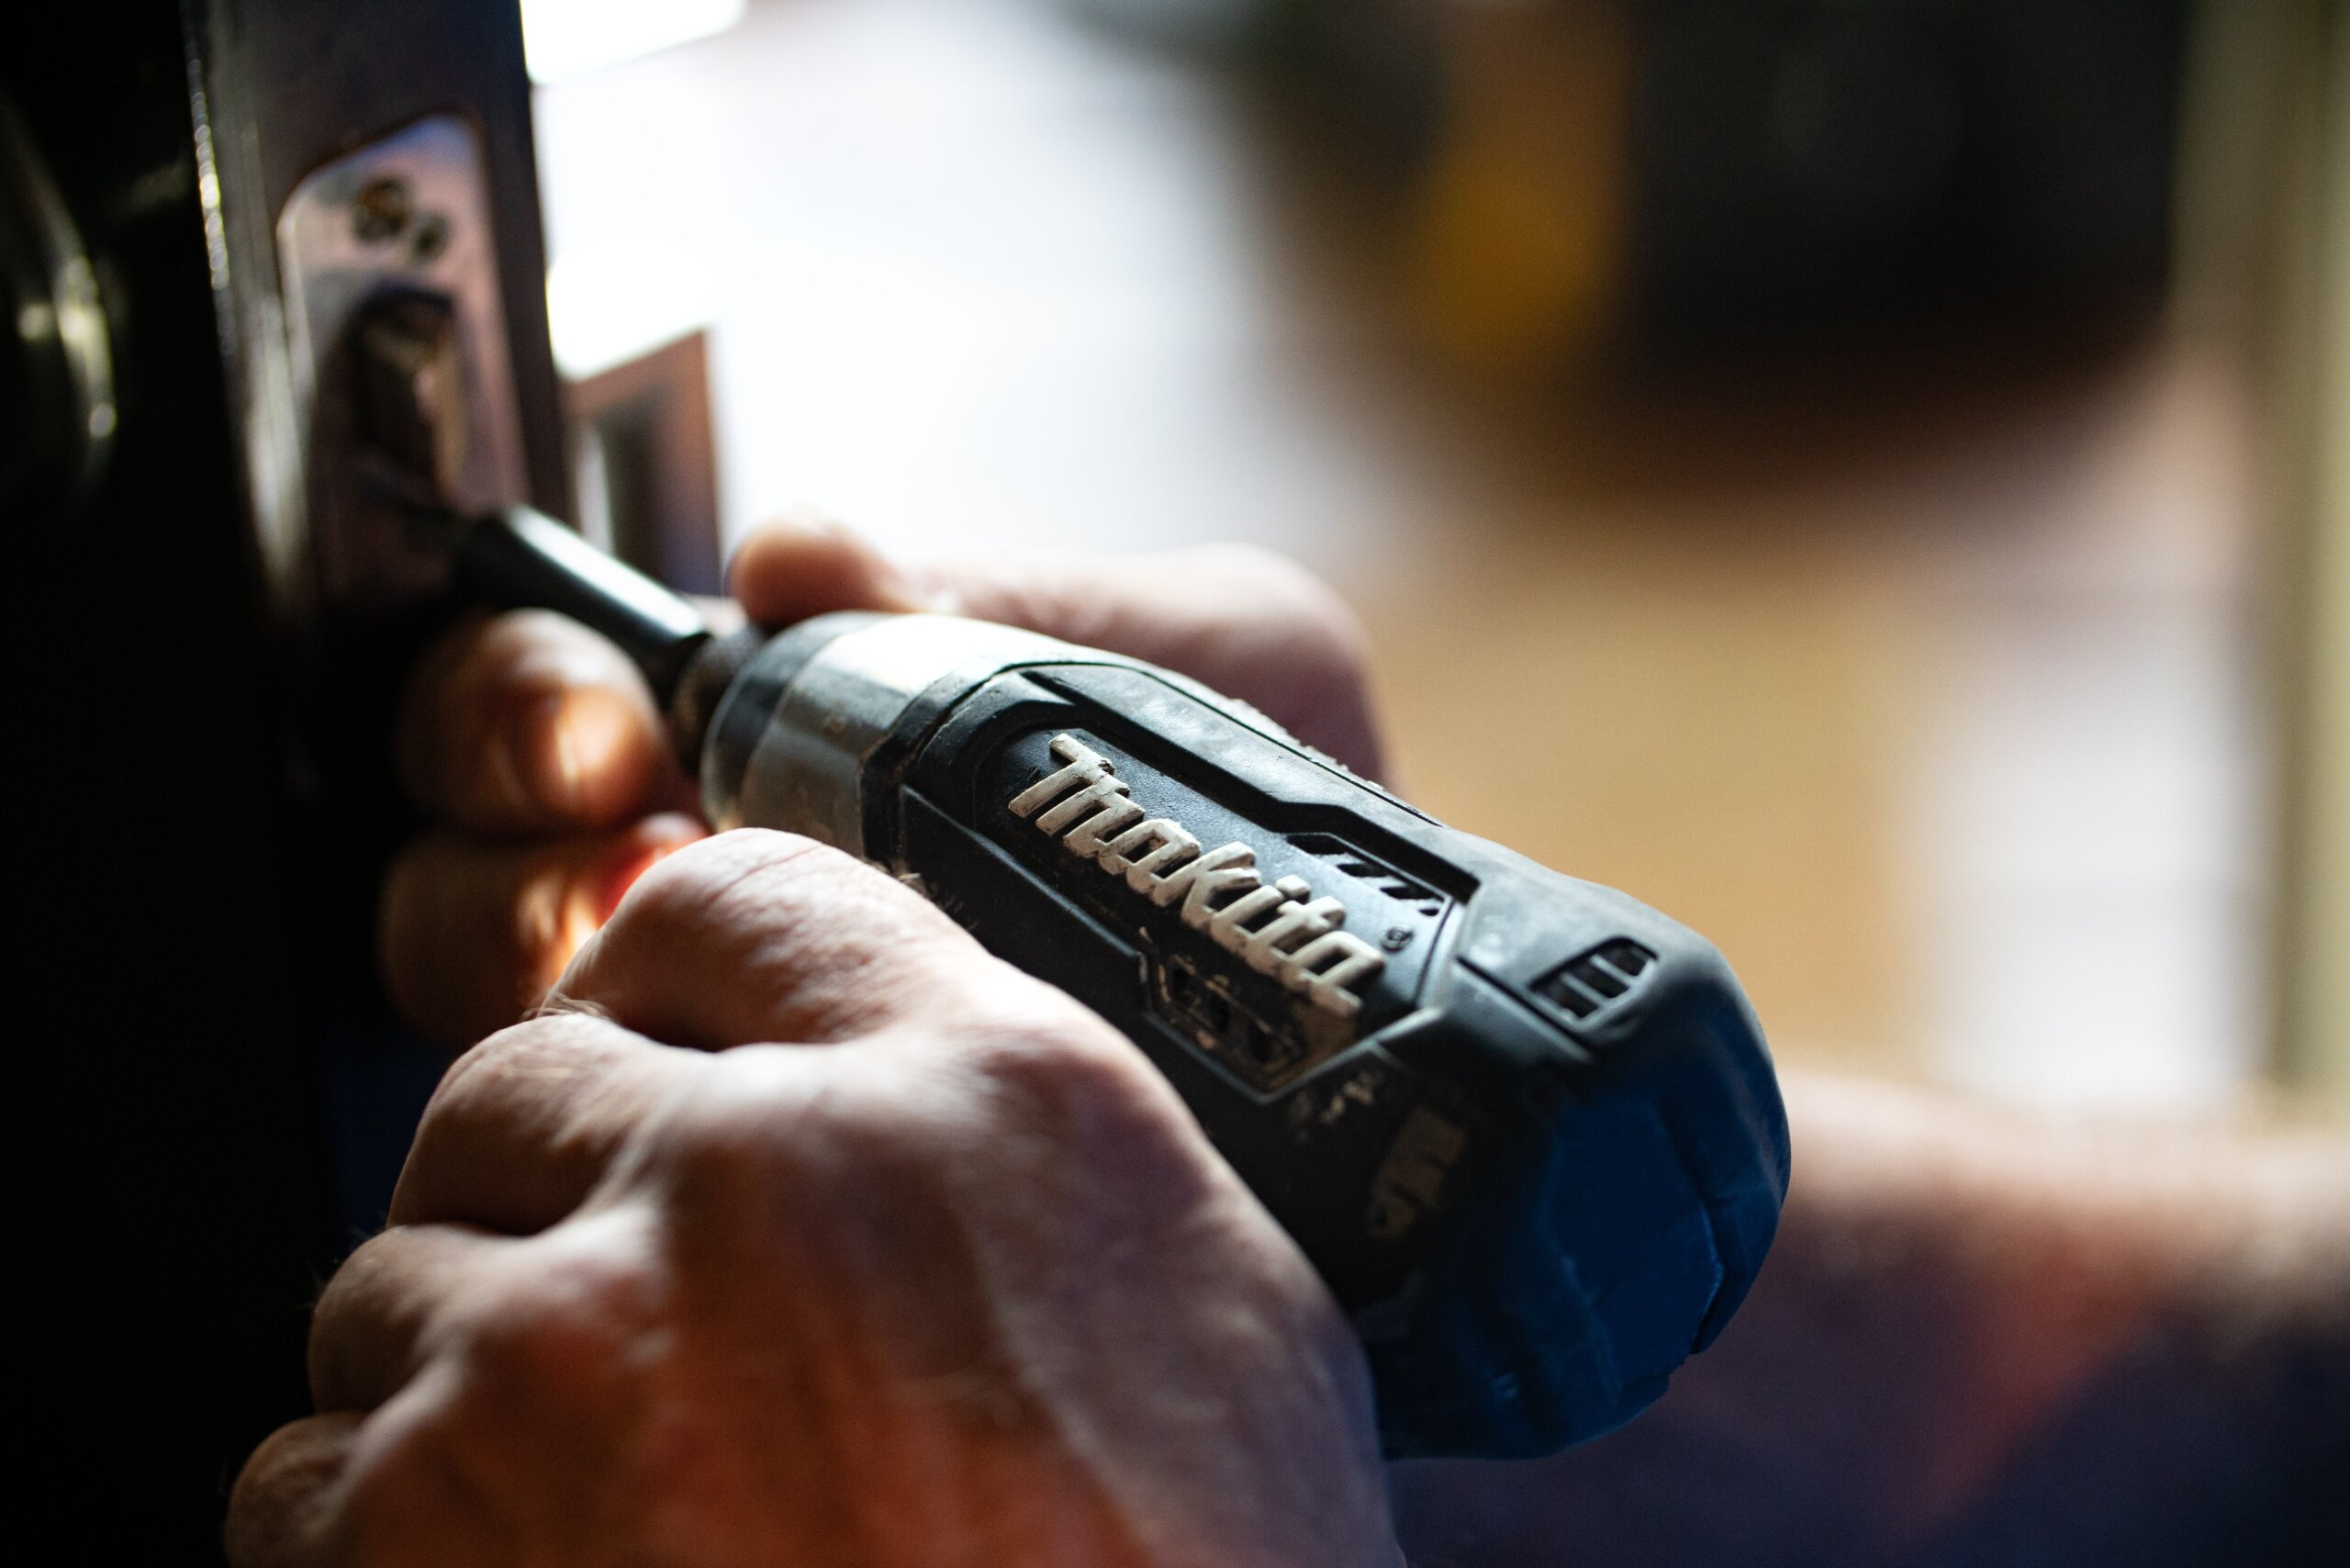 make property repairs amid covid-19 header image: two hands using a drill to make a repair